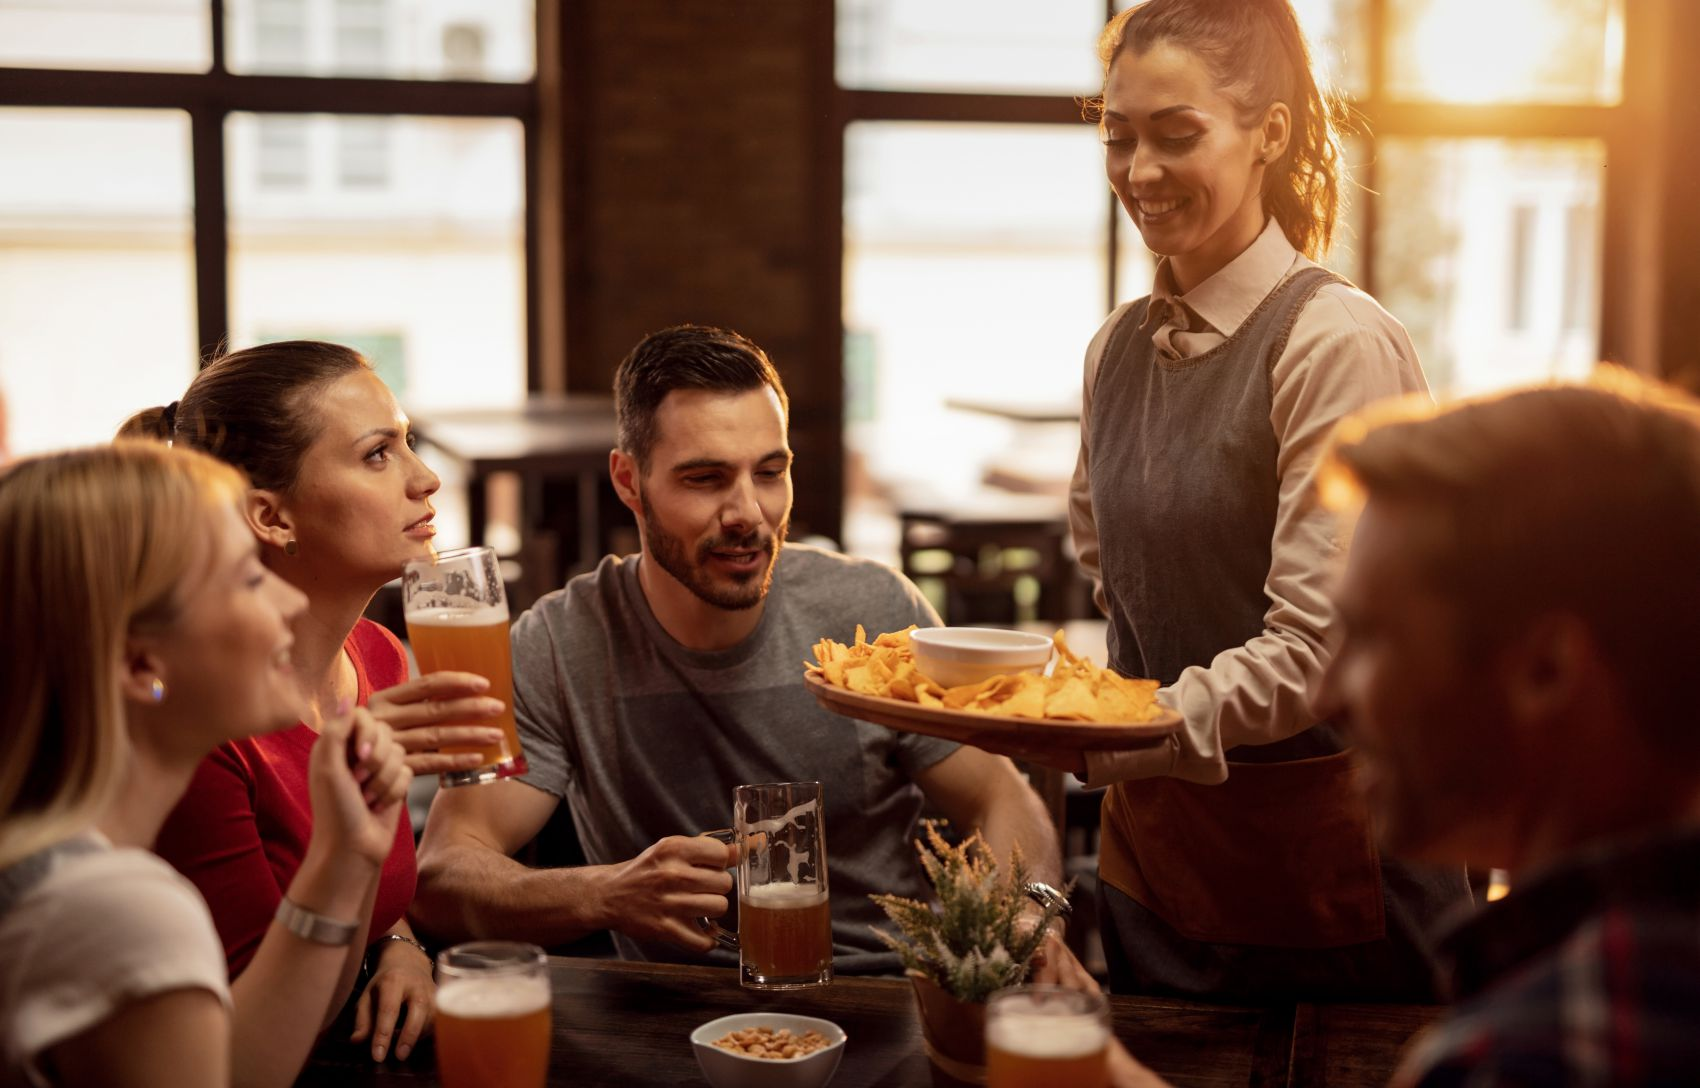 Hospitality-restaurant-service